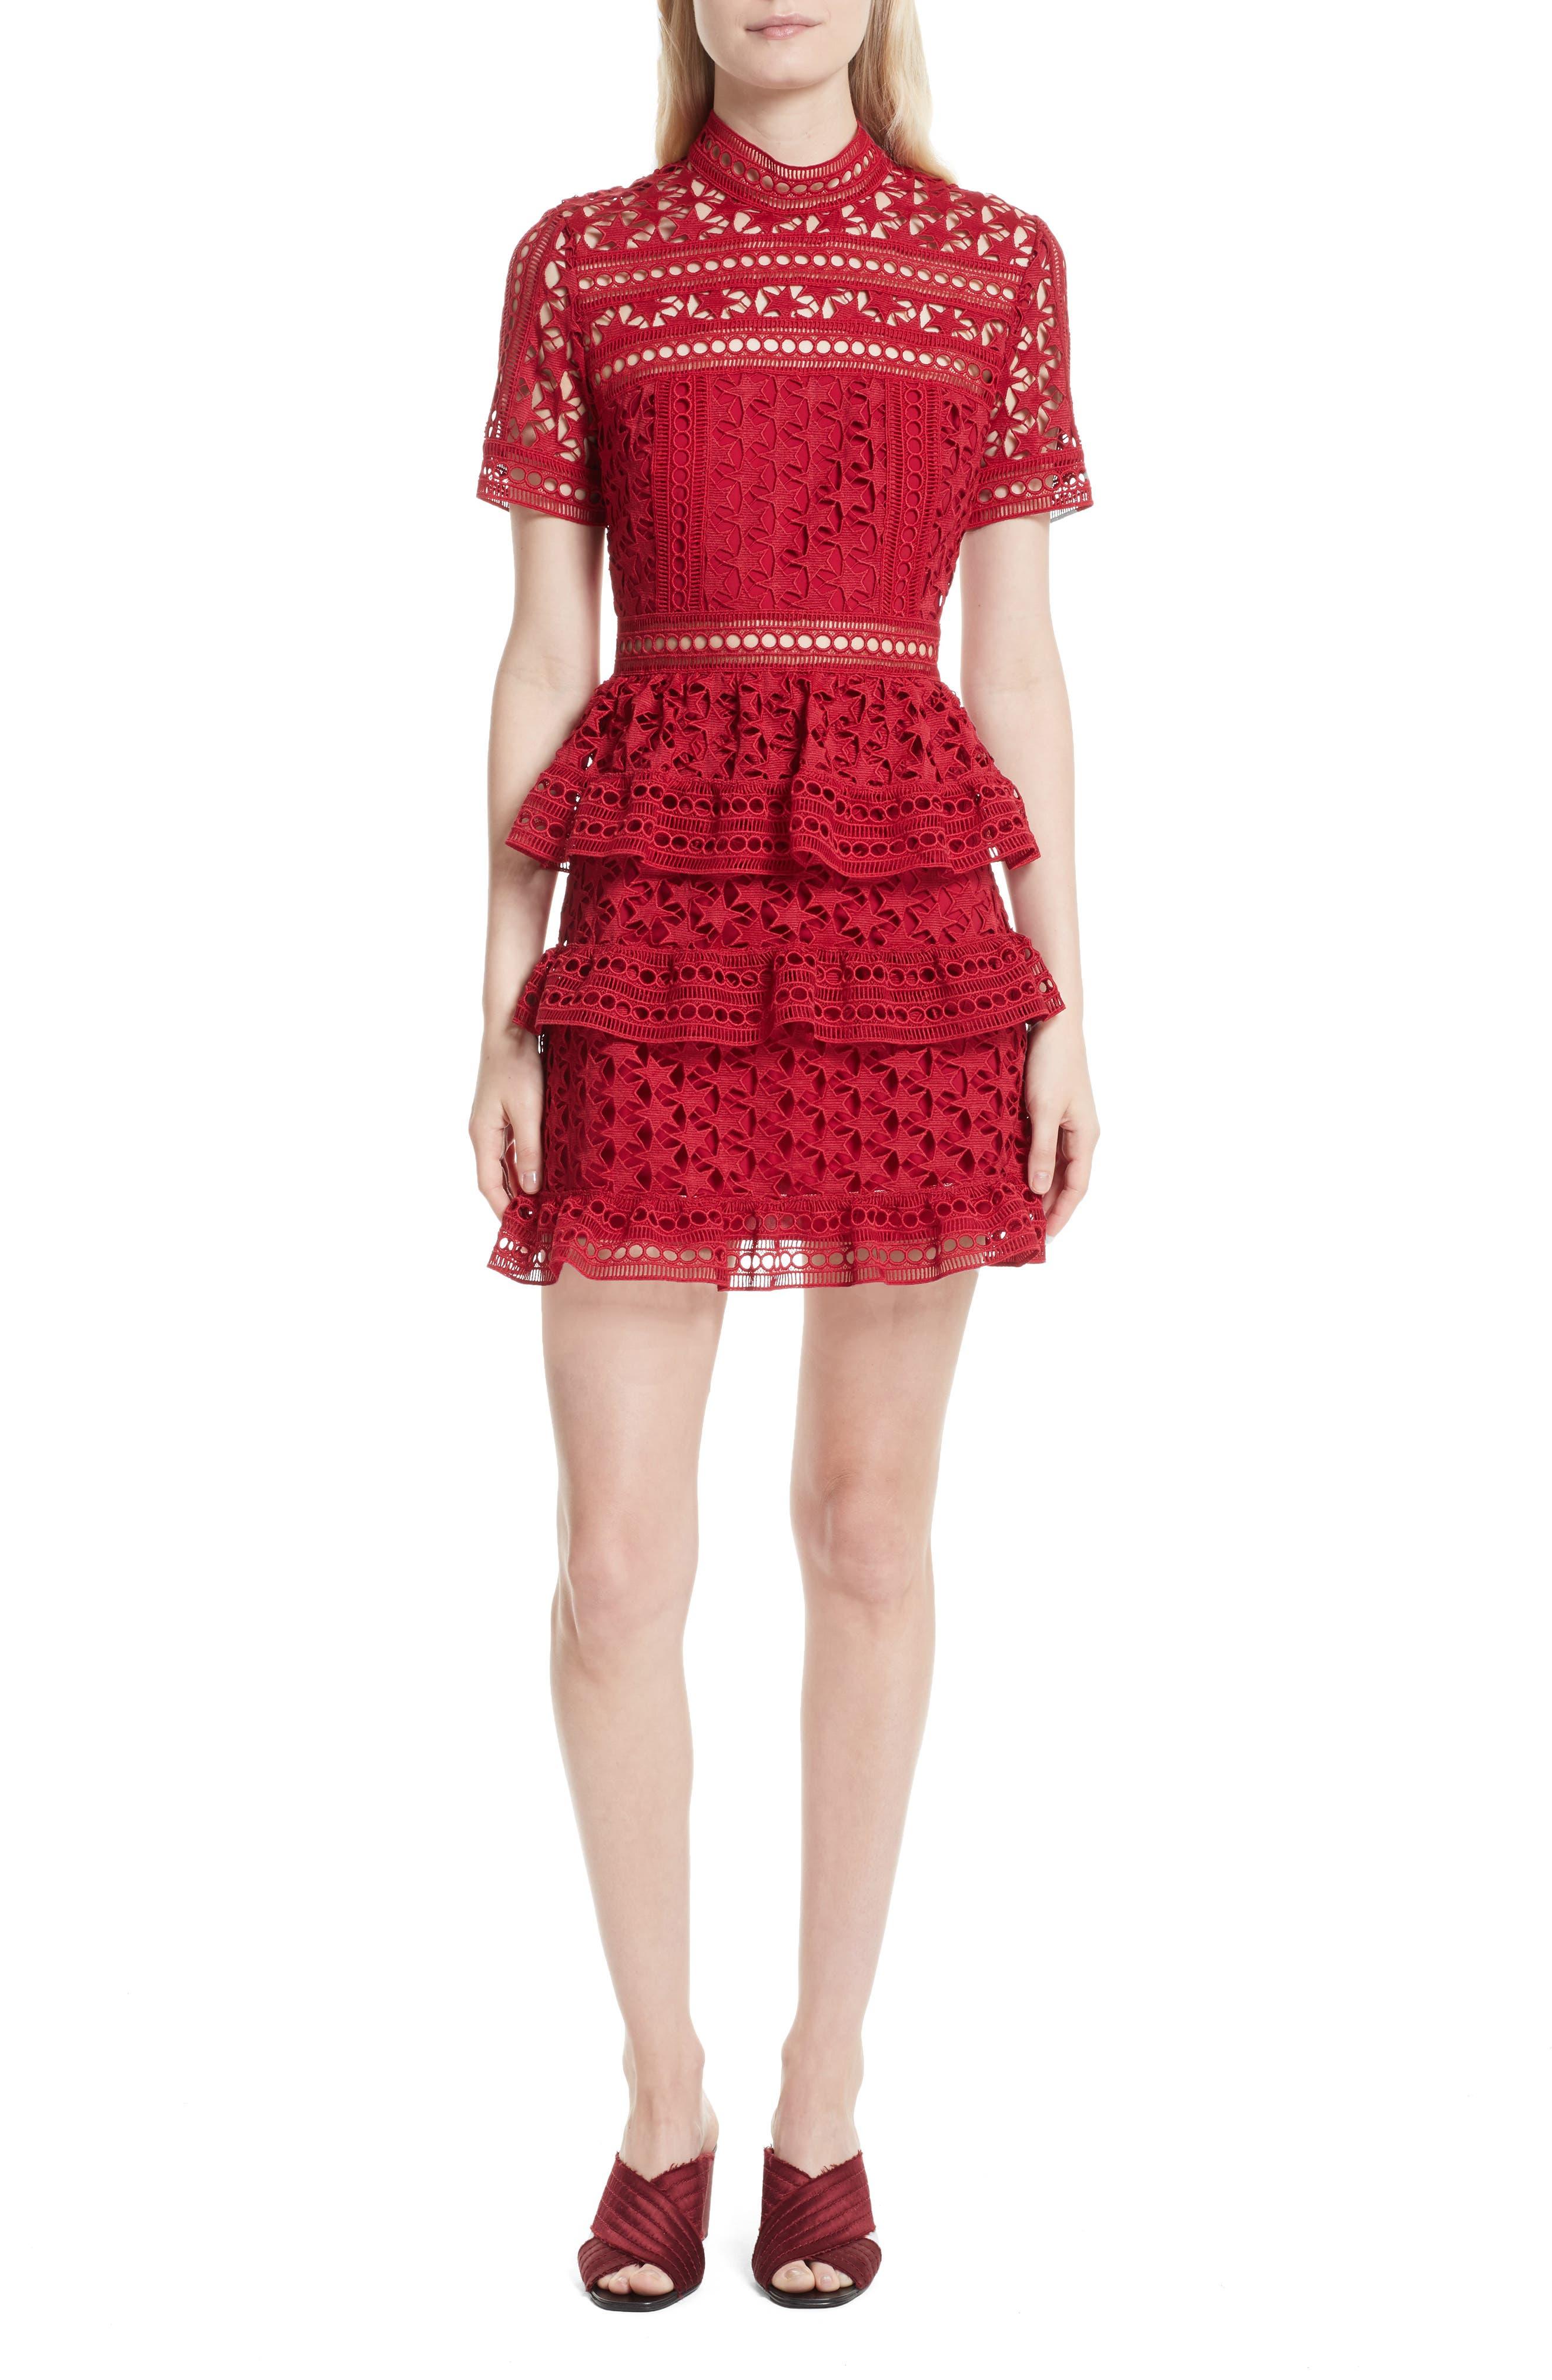 Self-Portrait Ruffle Star Lace Dress